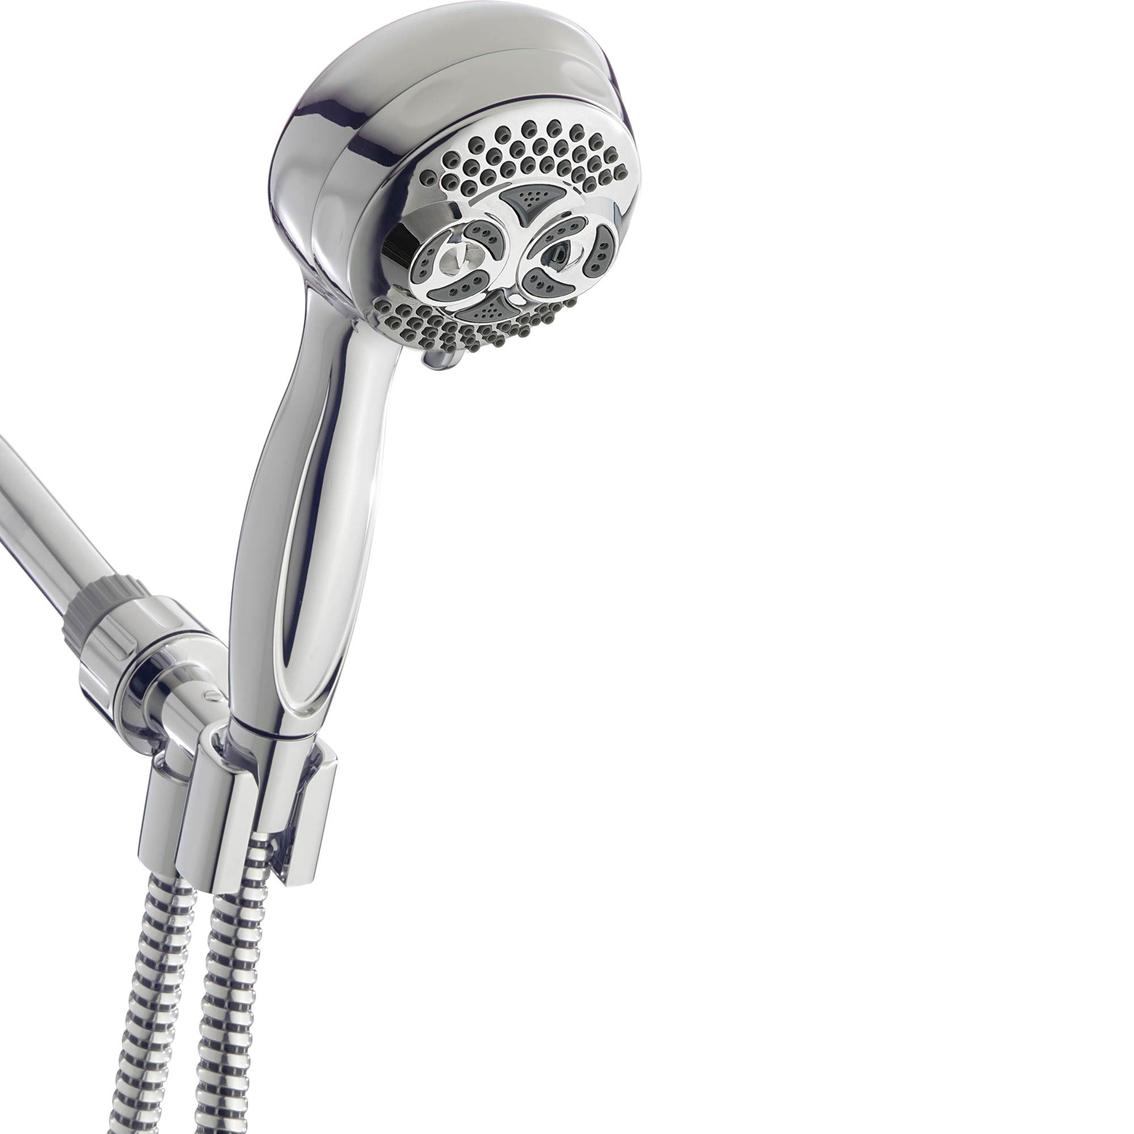 Waterpik Powerspray Twin Turbo Hand Held Shower Head Tub